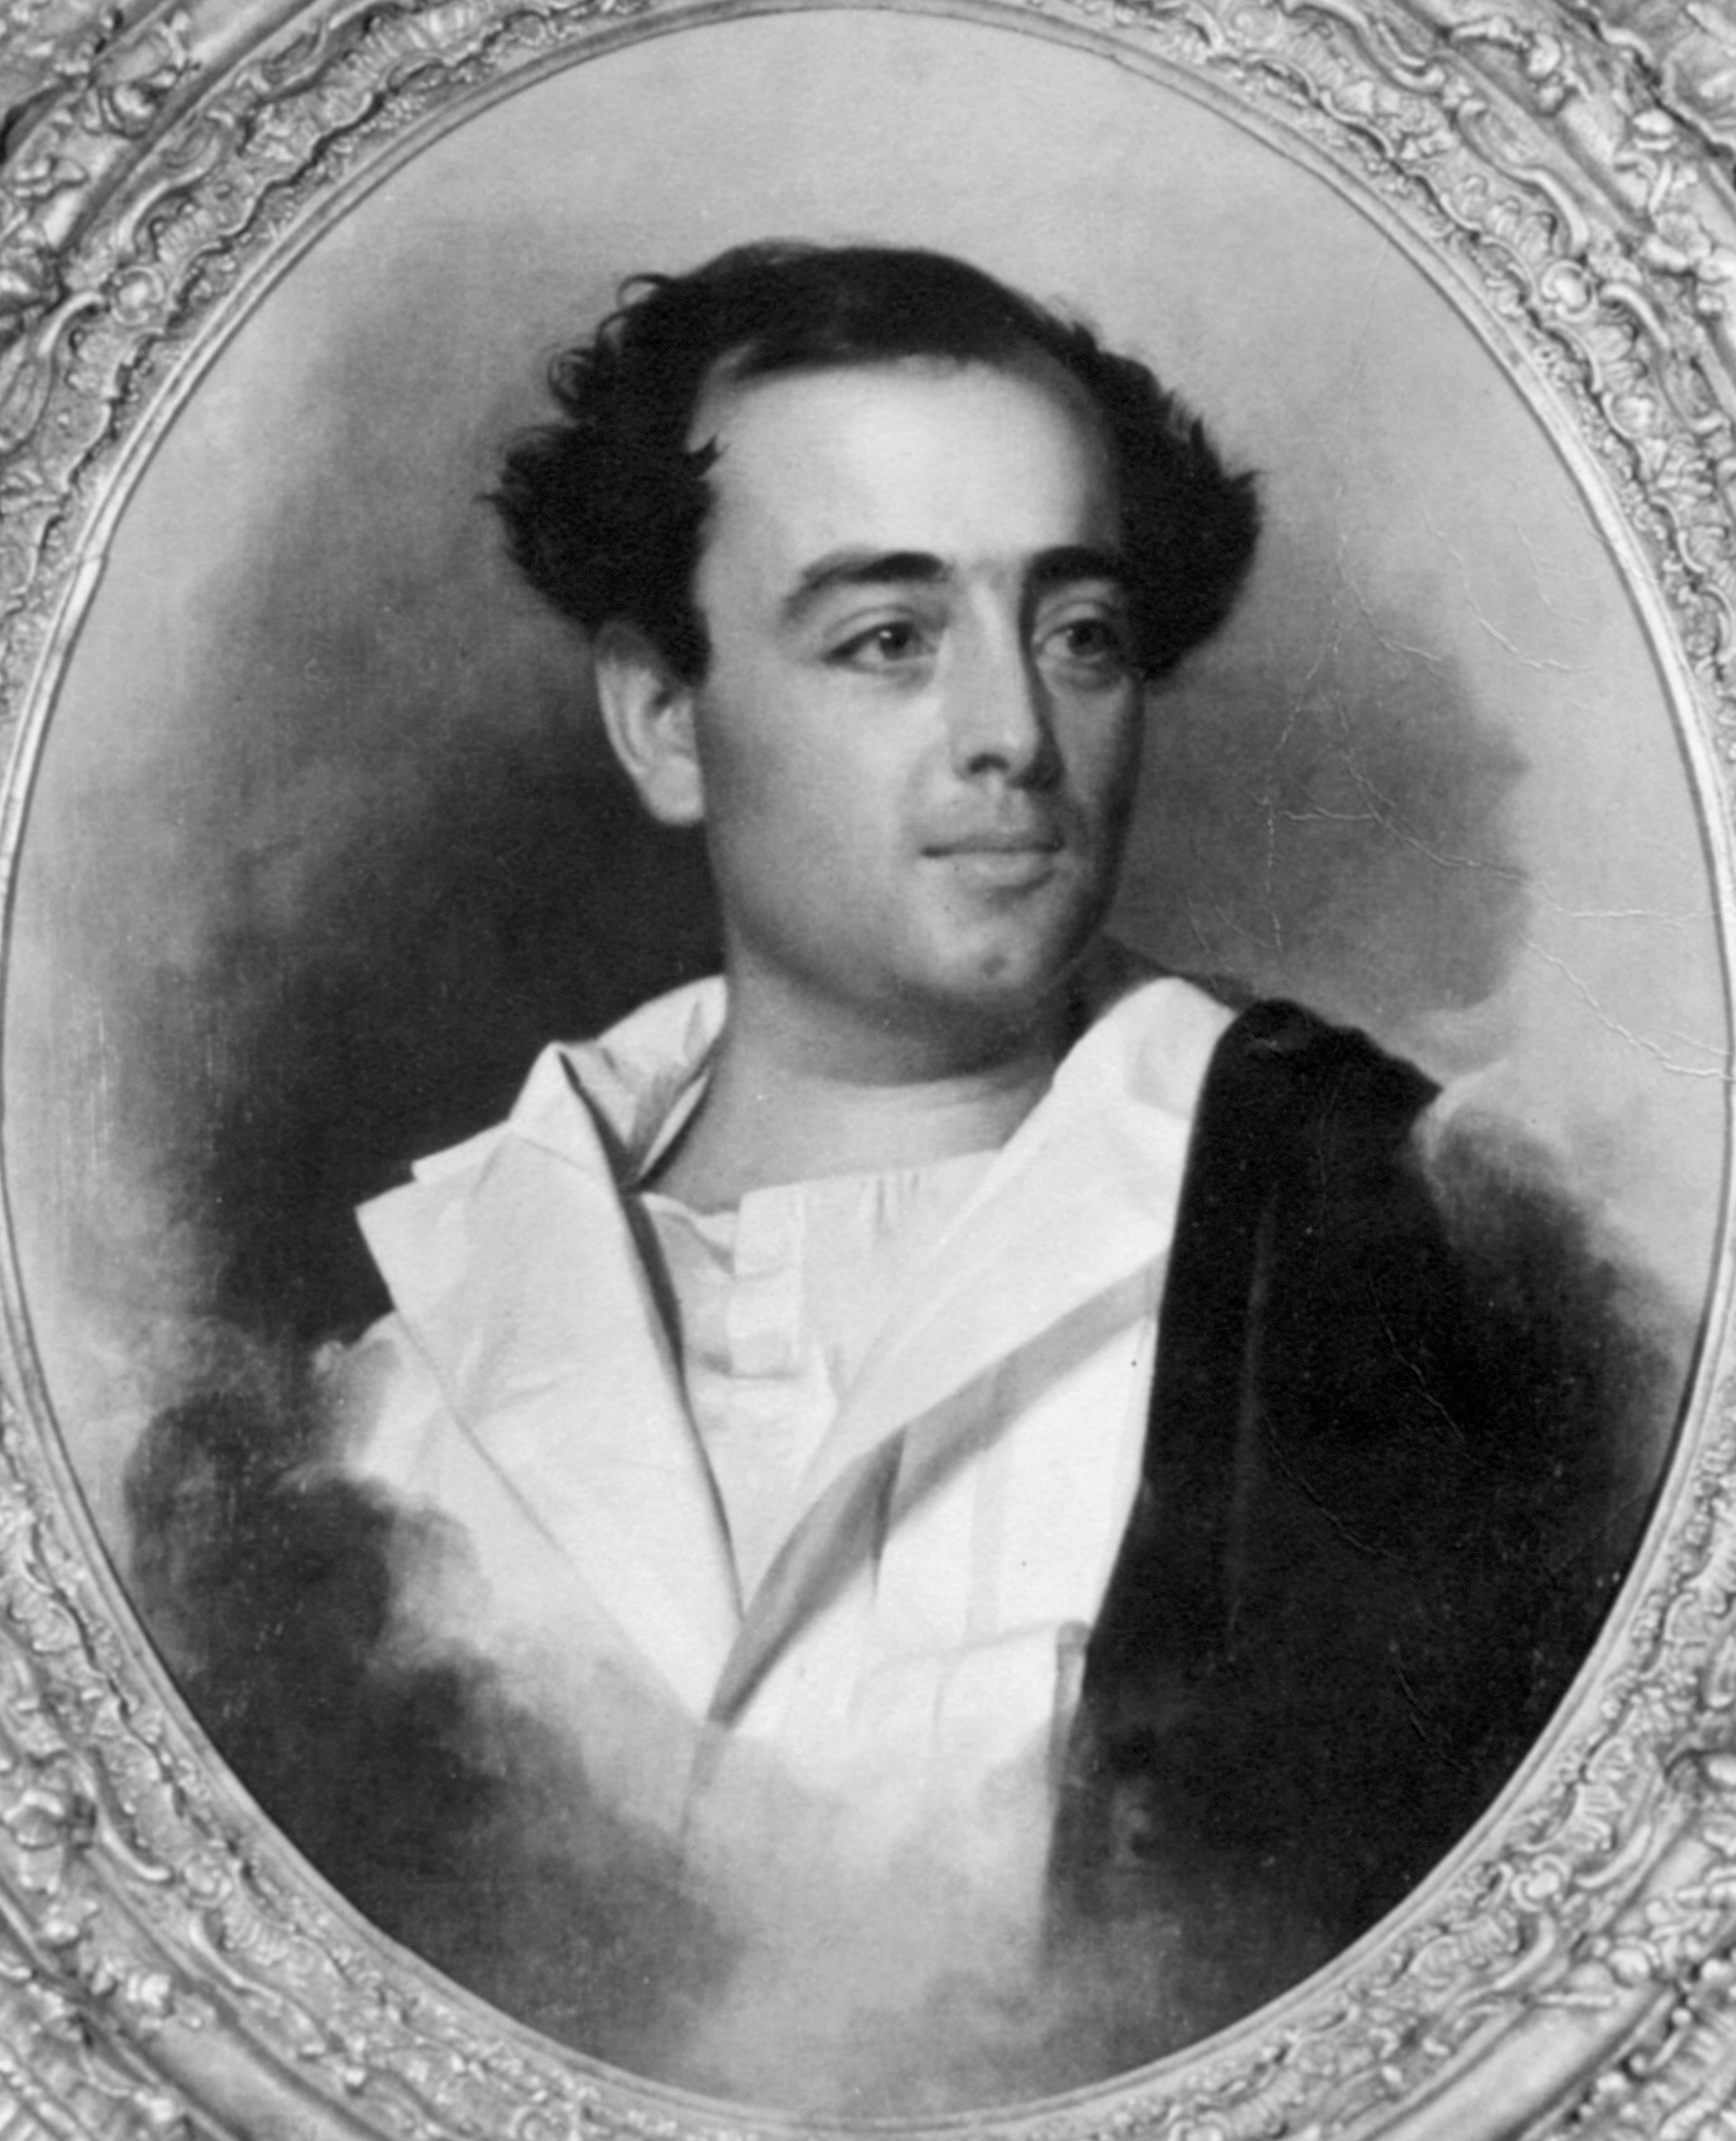 Stevens T. Mason, undated